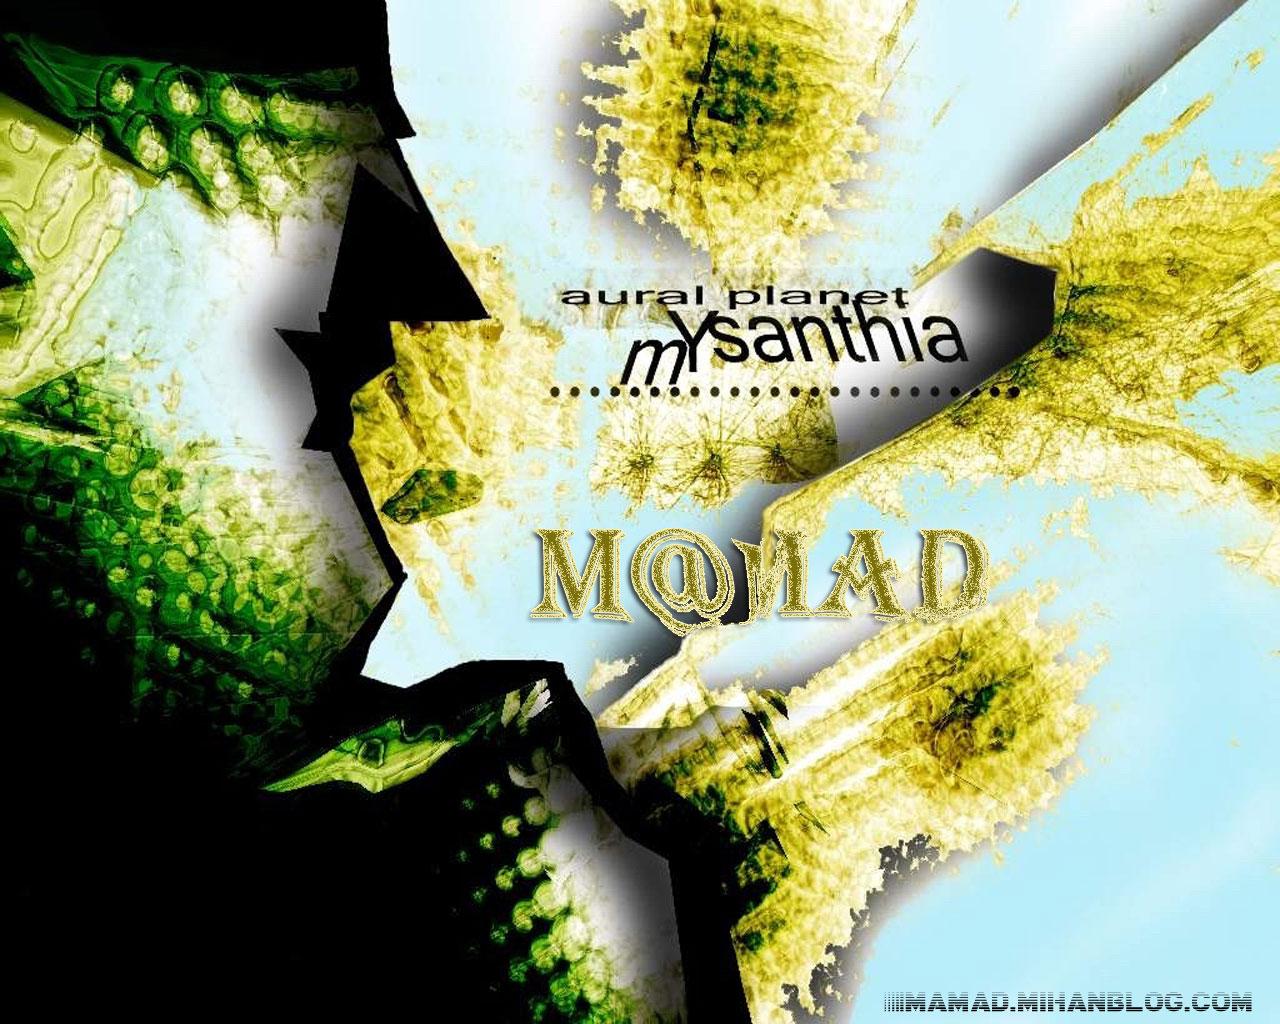 M@mad.mihanblog.com       ASSISTANT 2007